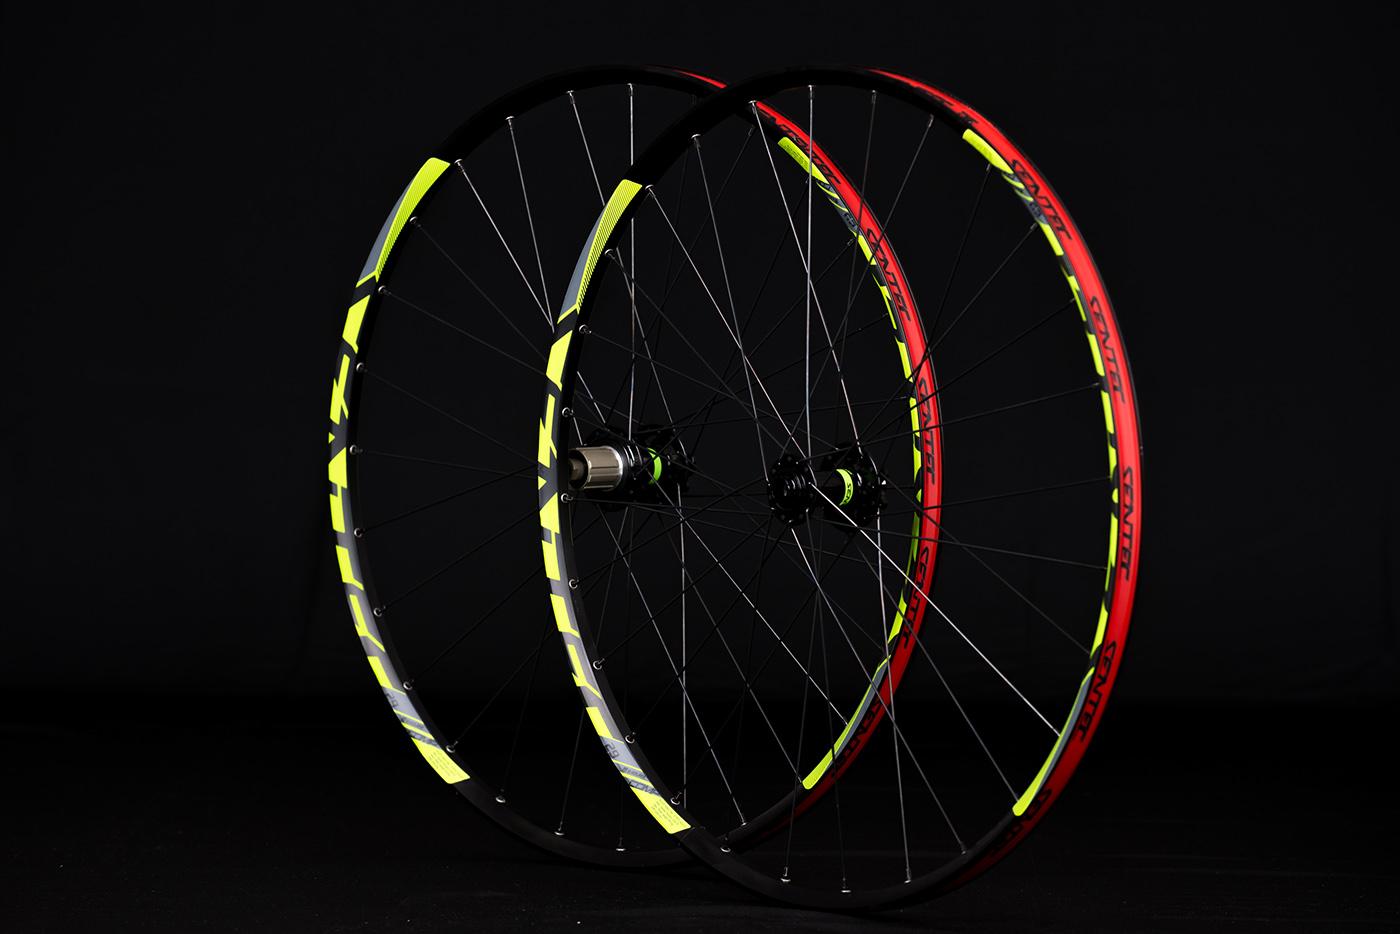 wheel Carbon Wheel Roda de bike Wheel bicylce Gabriel Delfino Delfino Design Bike Bicycle cycle road wheel